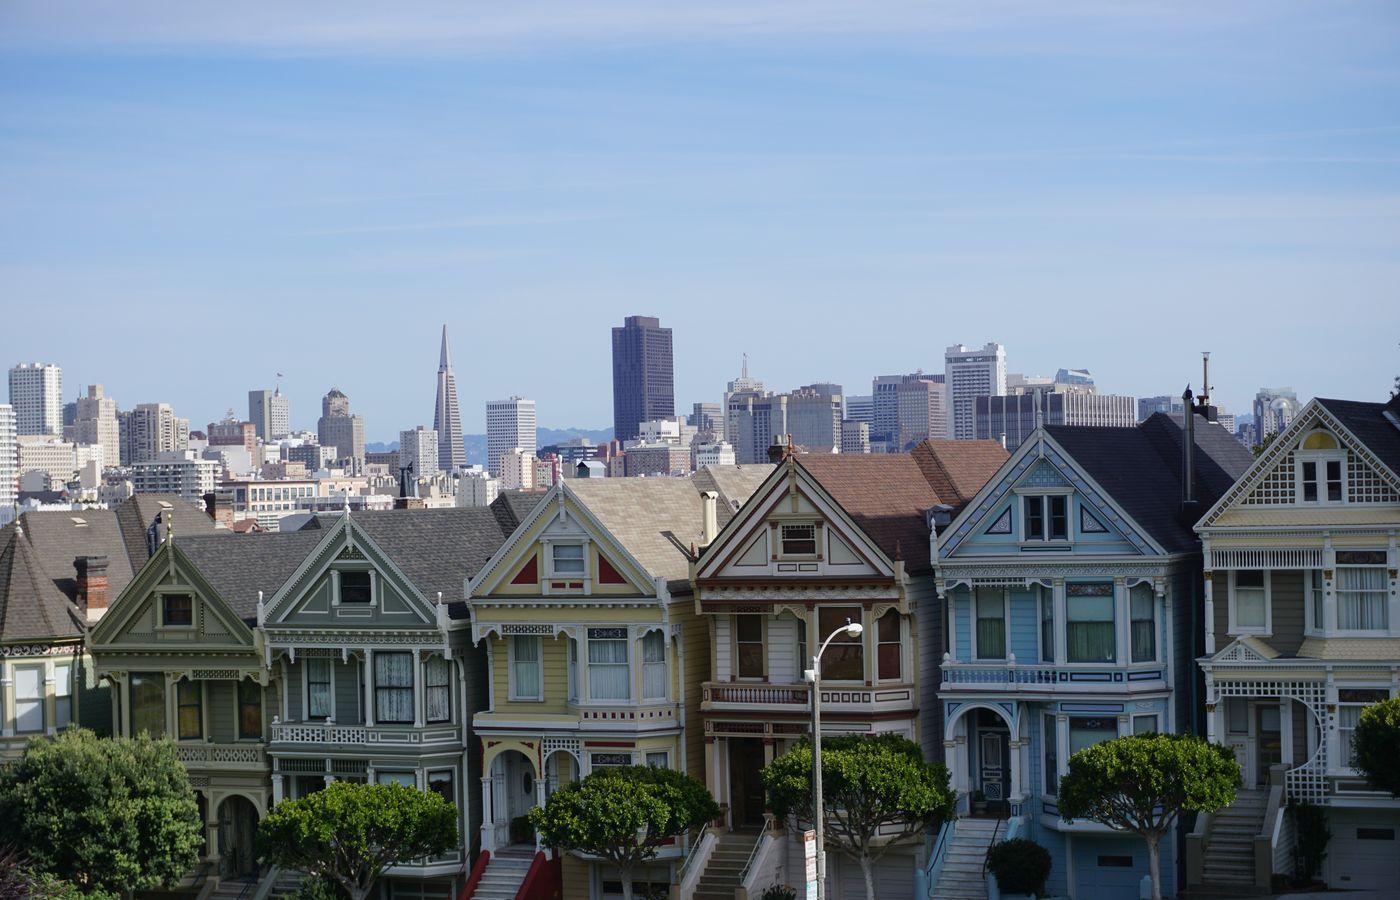 San Francisco guidebook http://blog.favoroute.com/4-days-in-san-francisco/